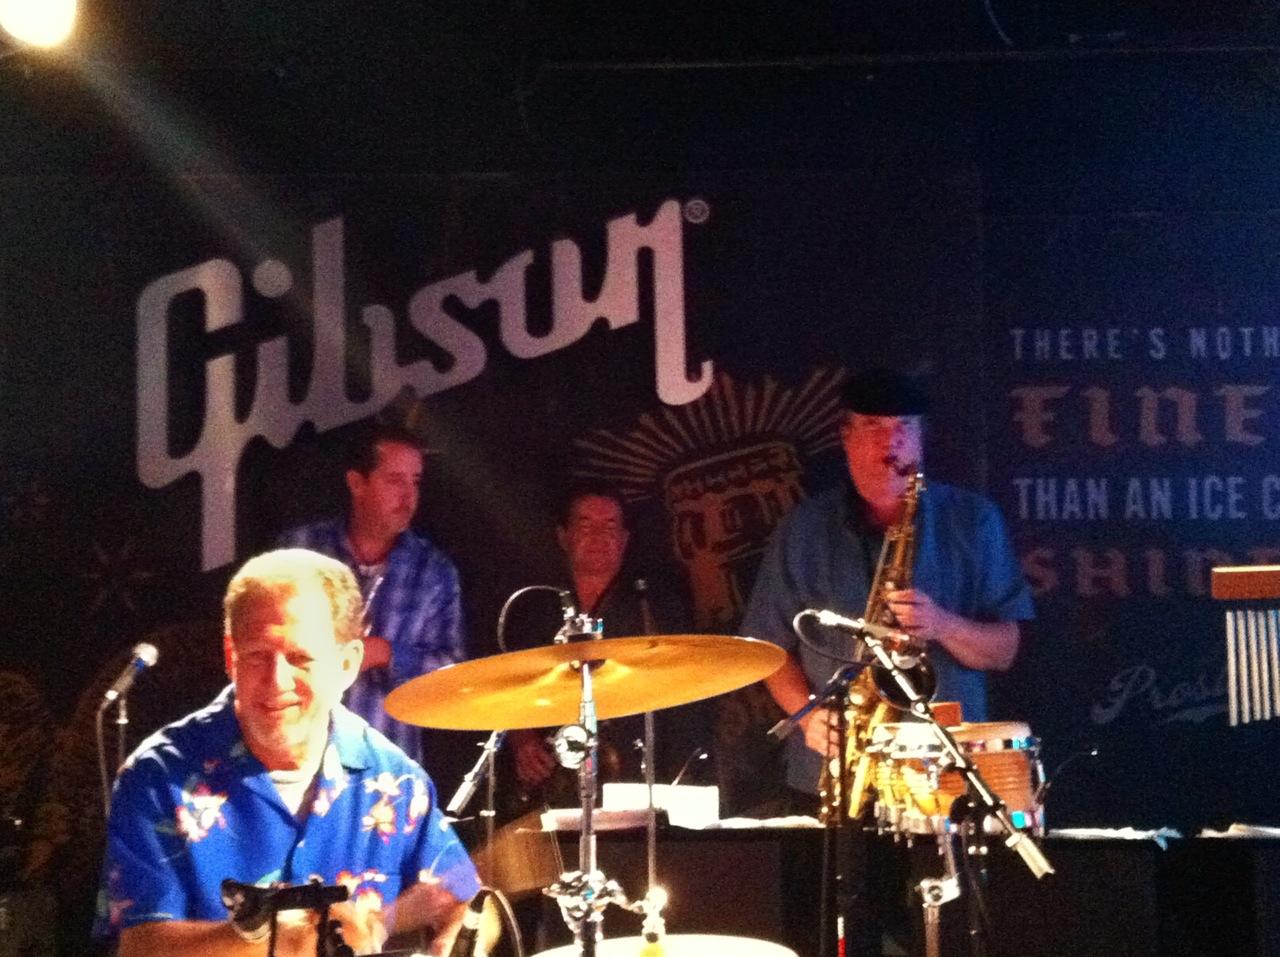 Drummer Steve Summer, with Beto's hornline featuring John Mills, Greg Williams, and Rich Haering.